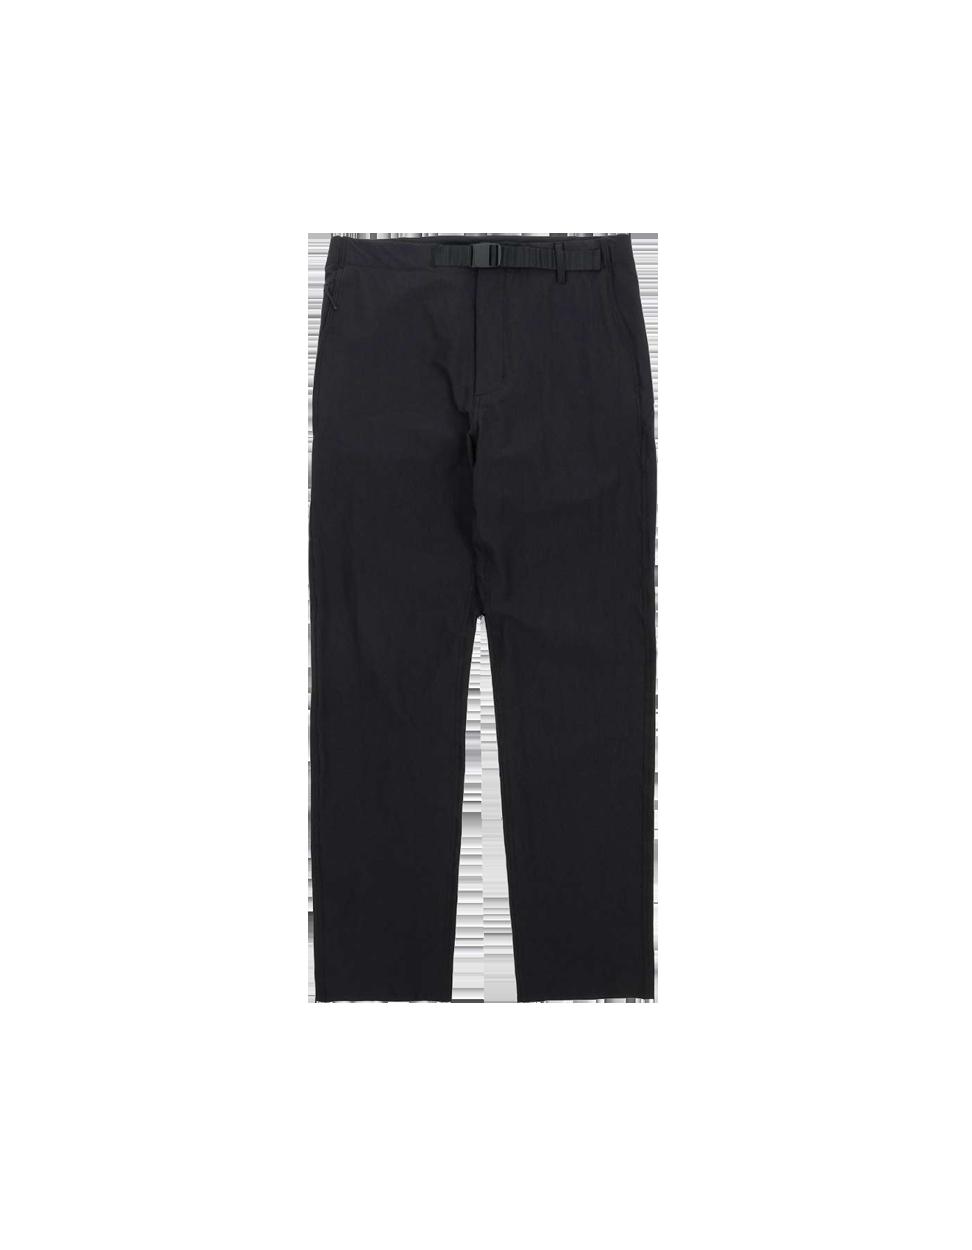 Nanamica Goldwin Technical Bonded Pants